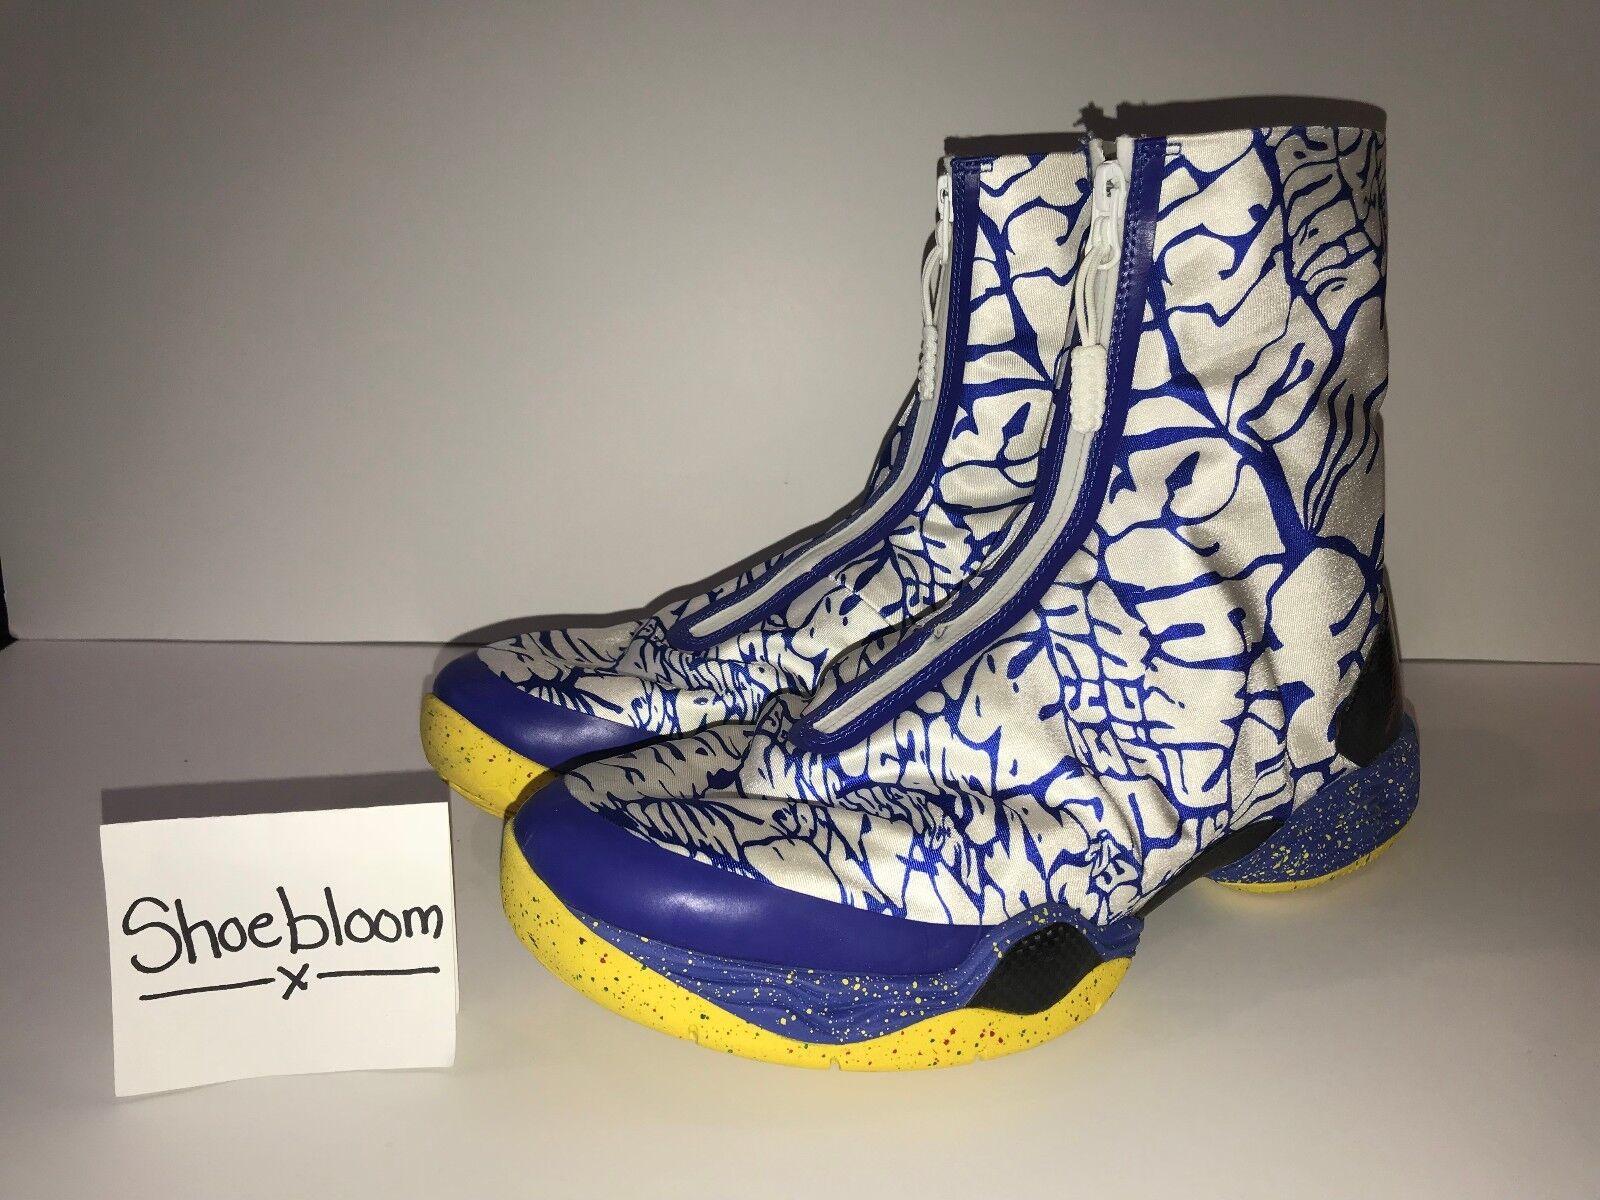 Jordan XX8 28 Russell Westbrook NBA Finals PE Size 11 100% Authentic Brand New